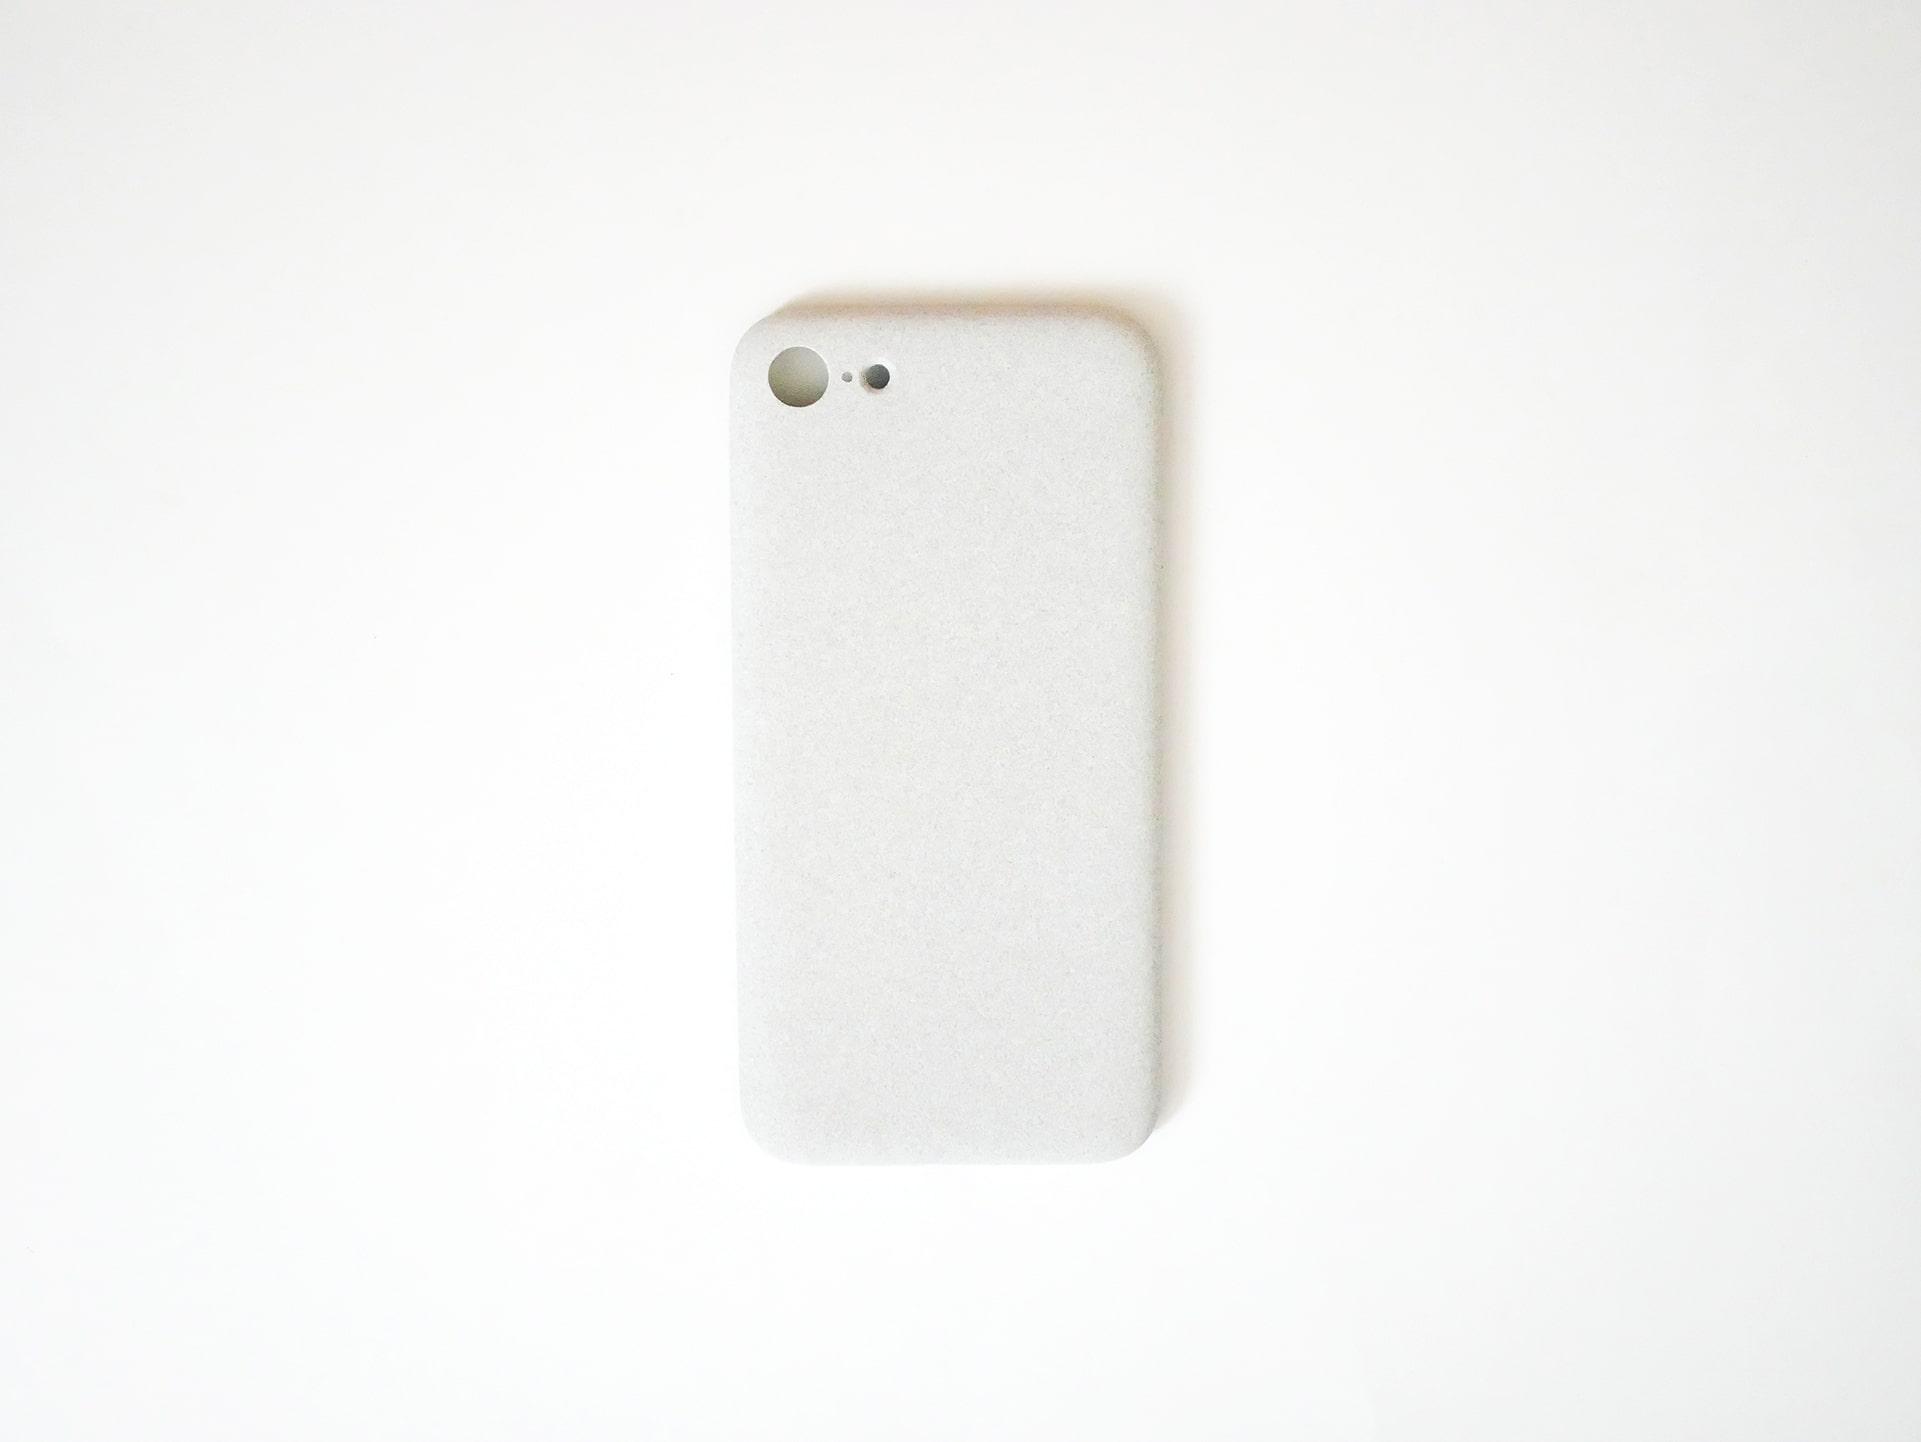 MYNUS iPhone SE CASE 本体